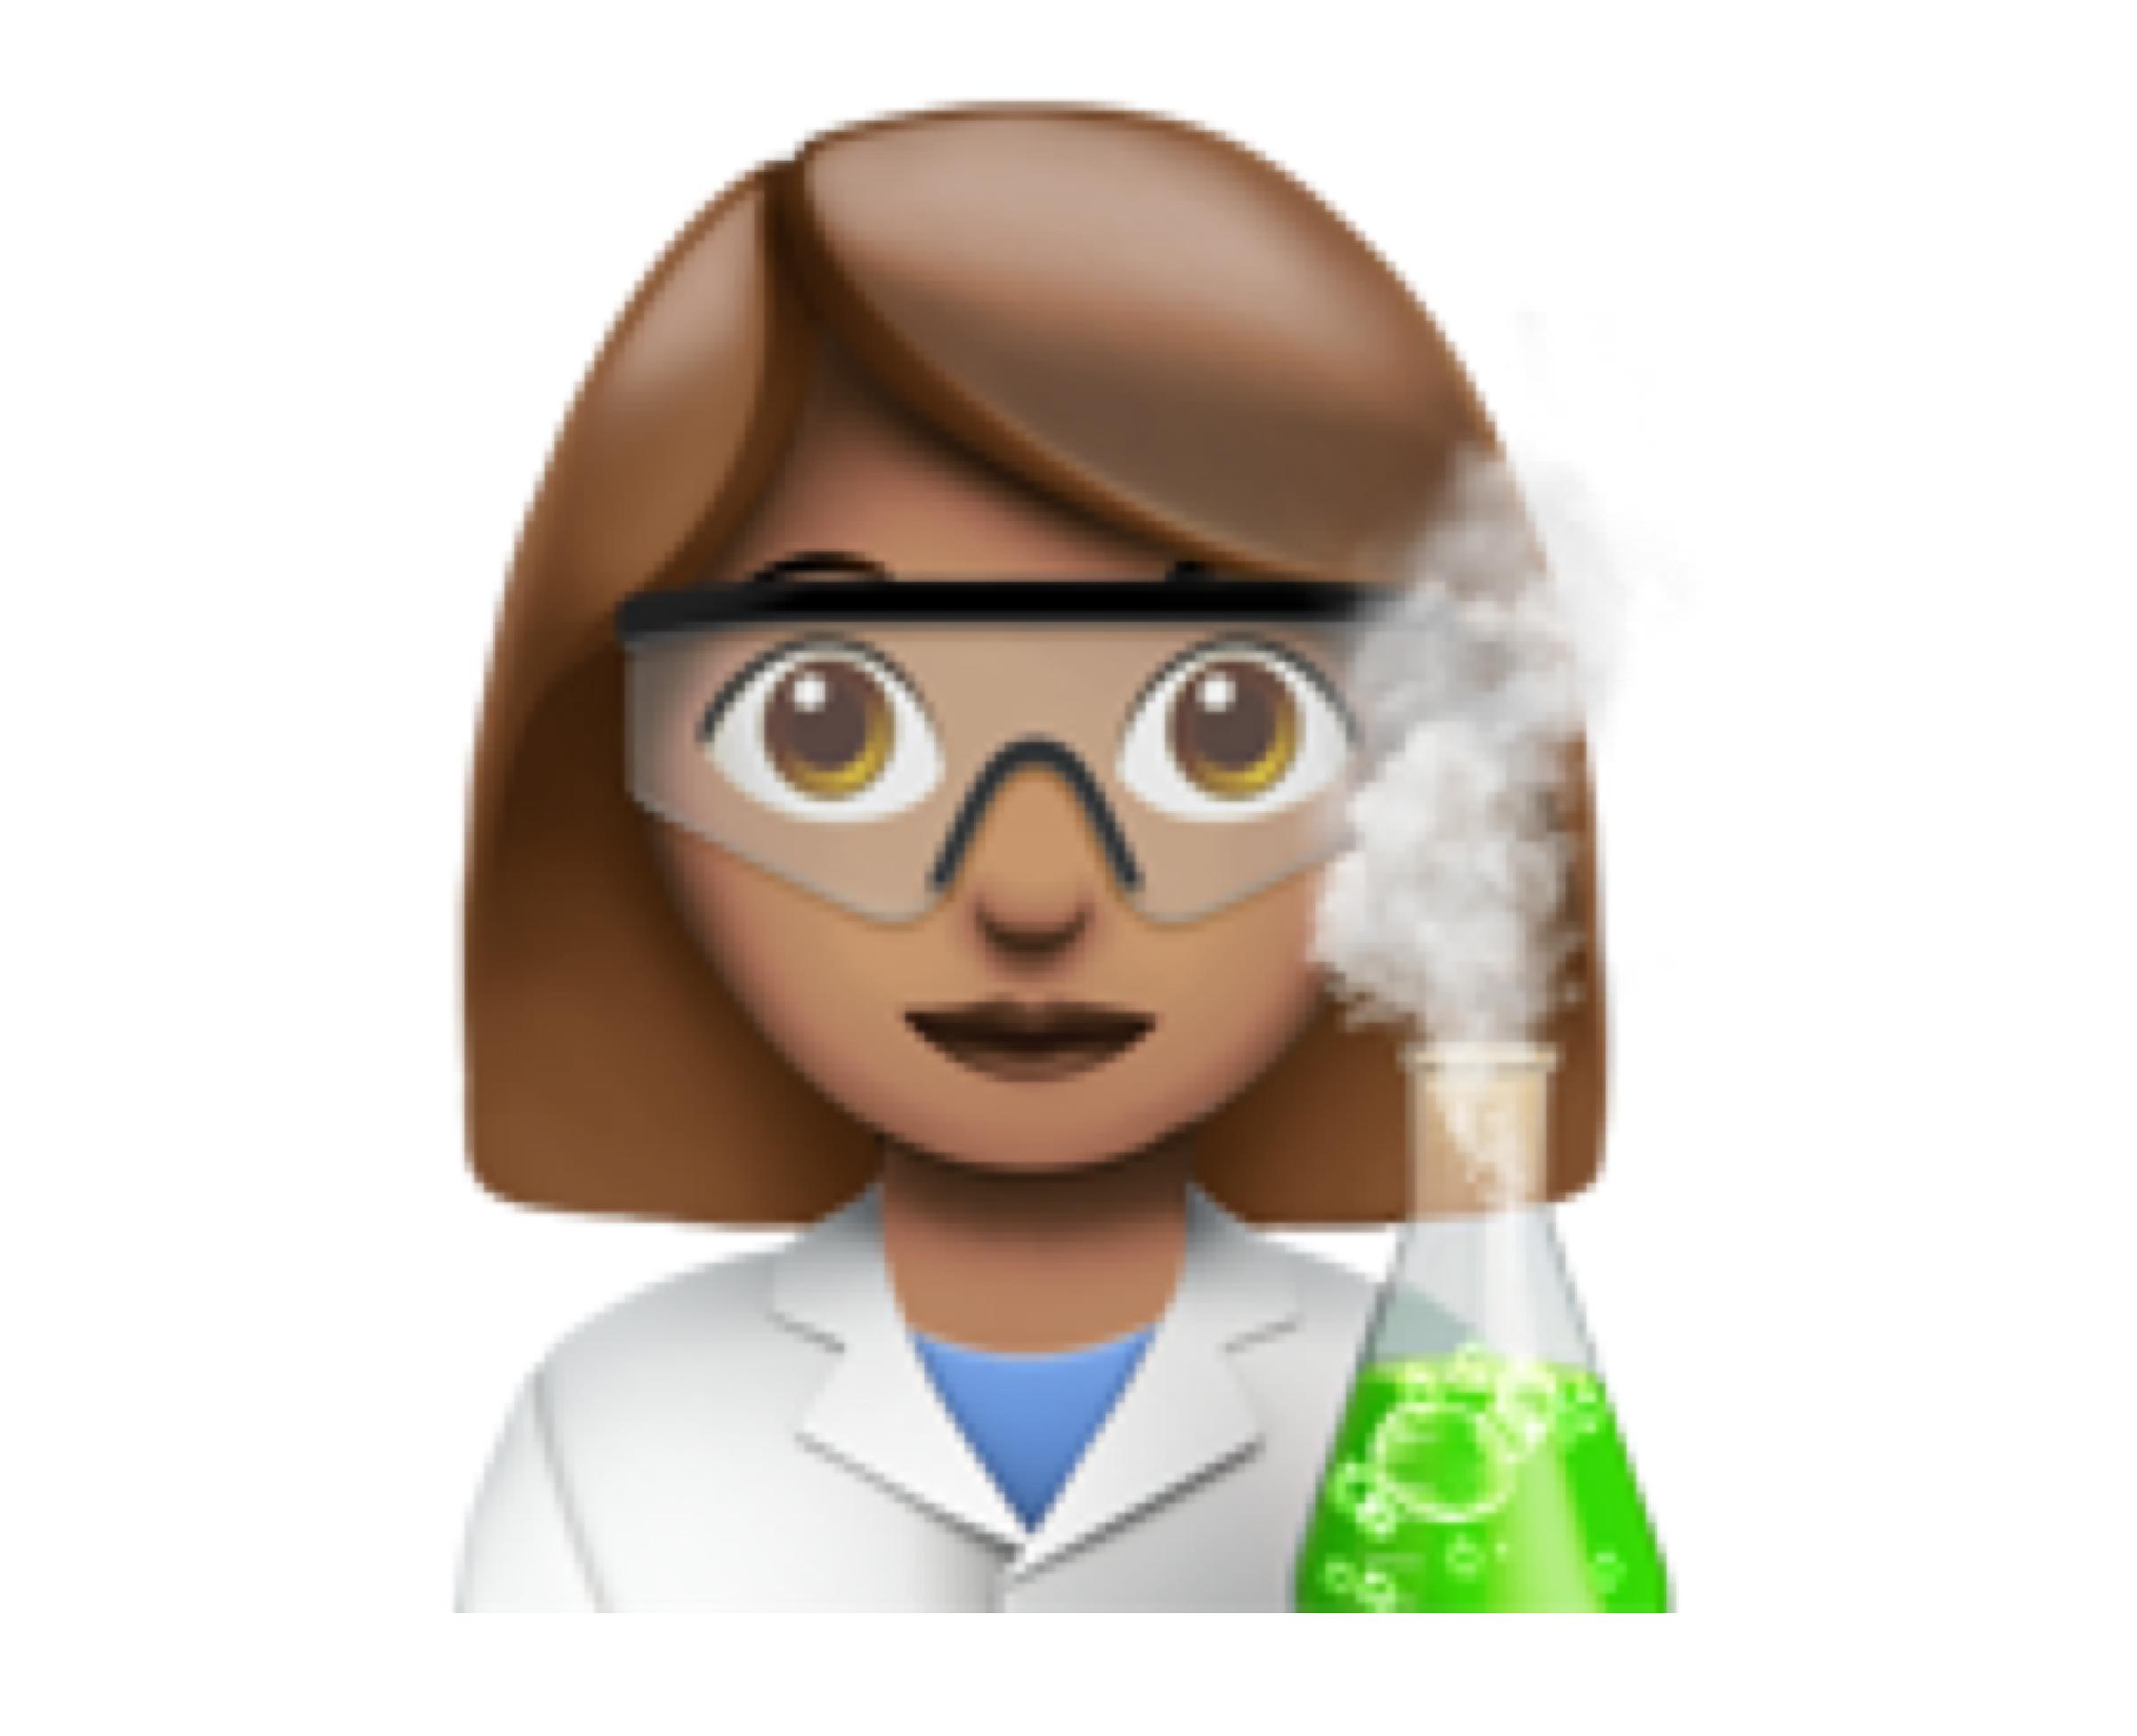 Woman scientist (👩🏽🔬)